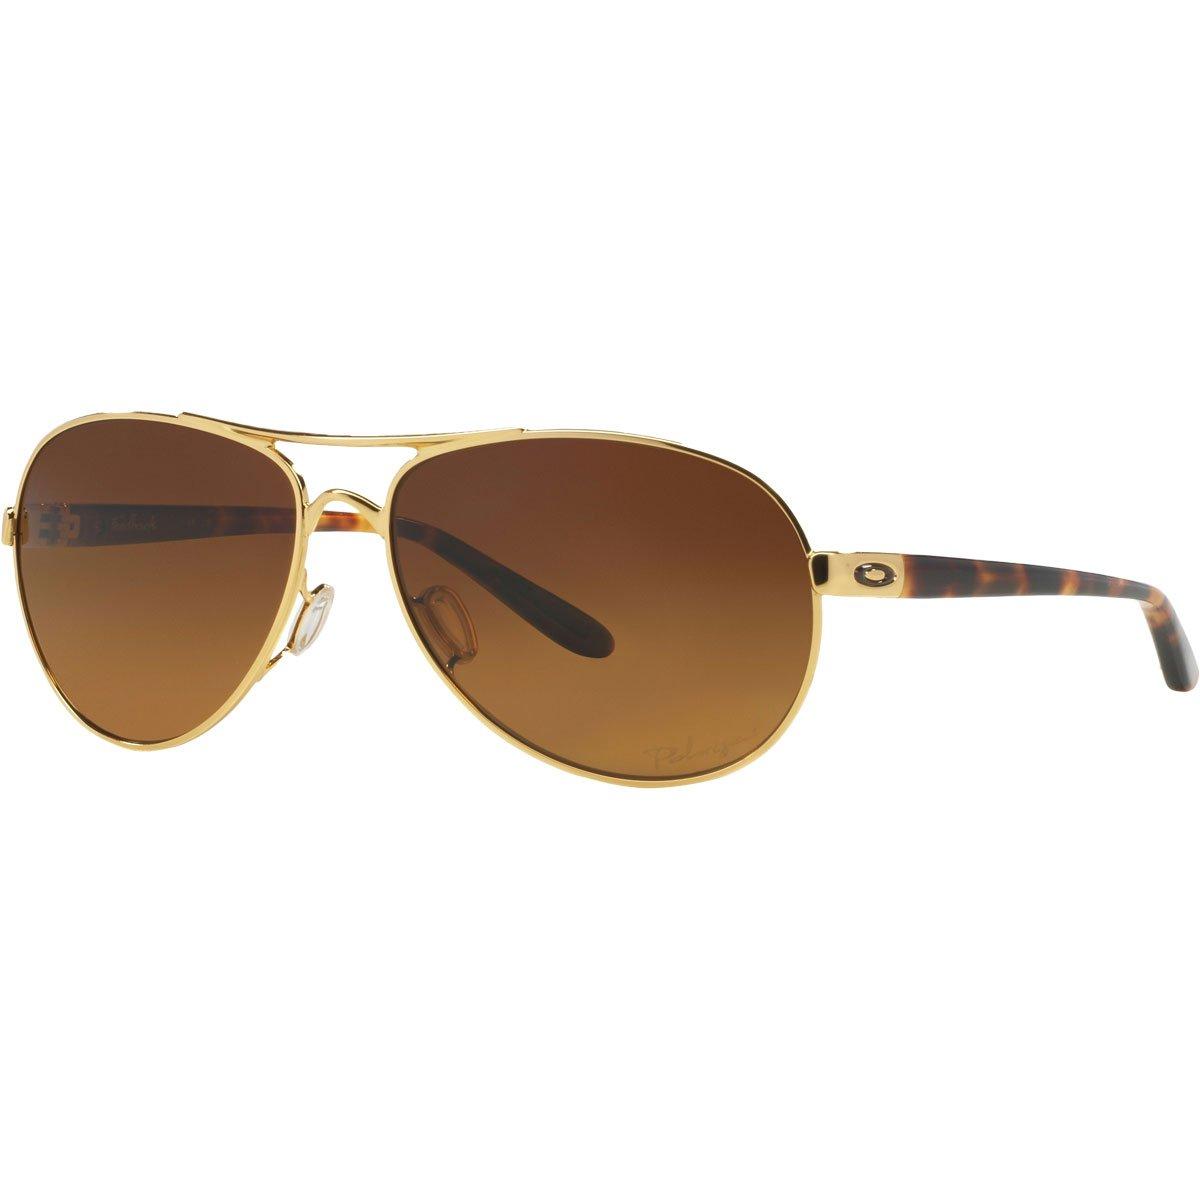 12ffce66e8688 Oakley Womens Feedback Polarized Sunglasses